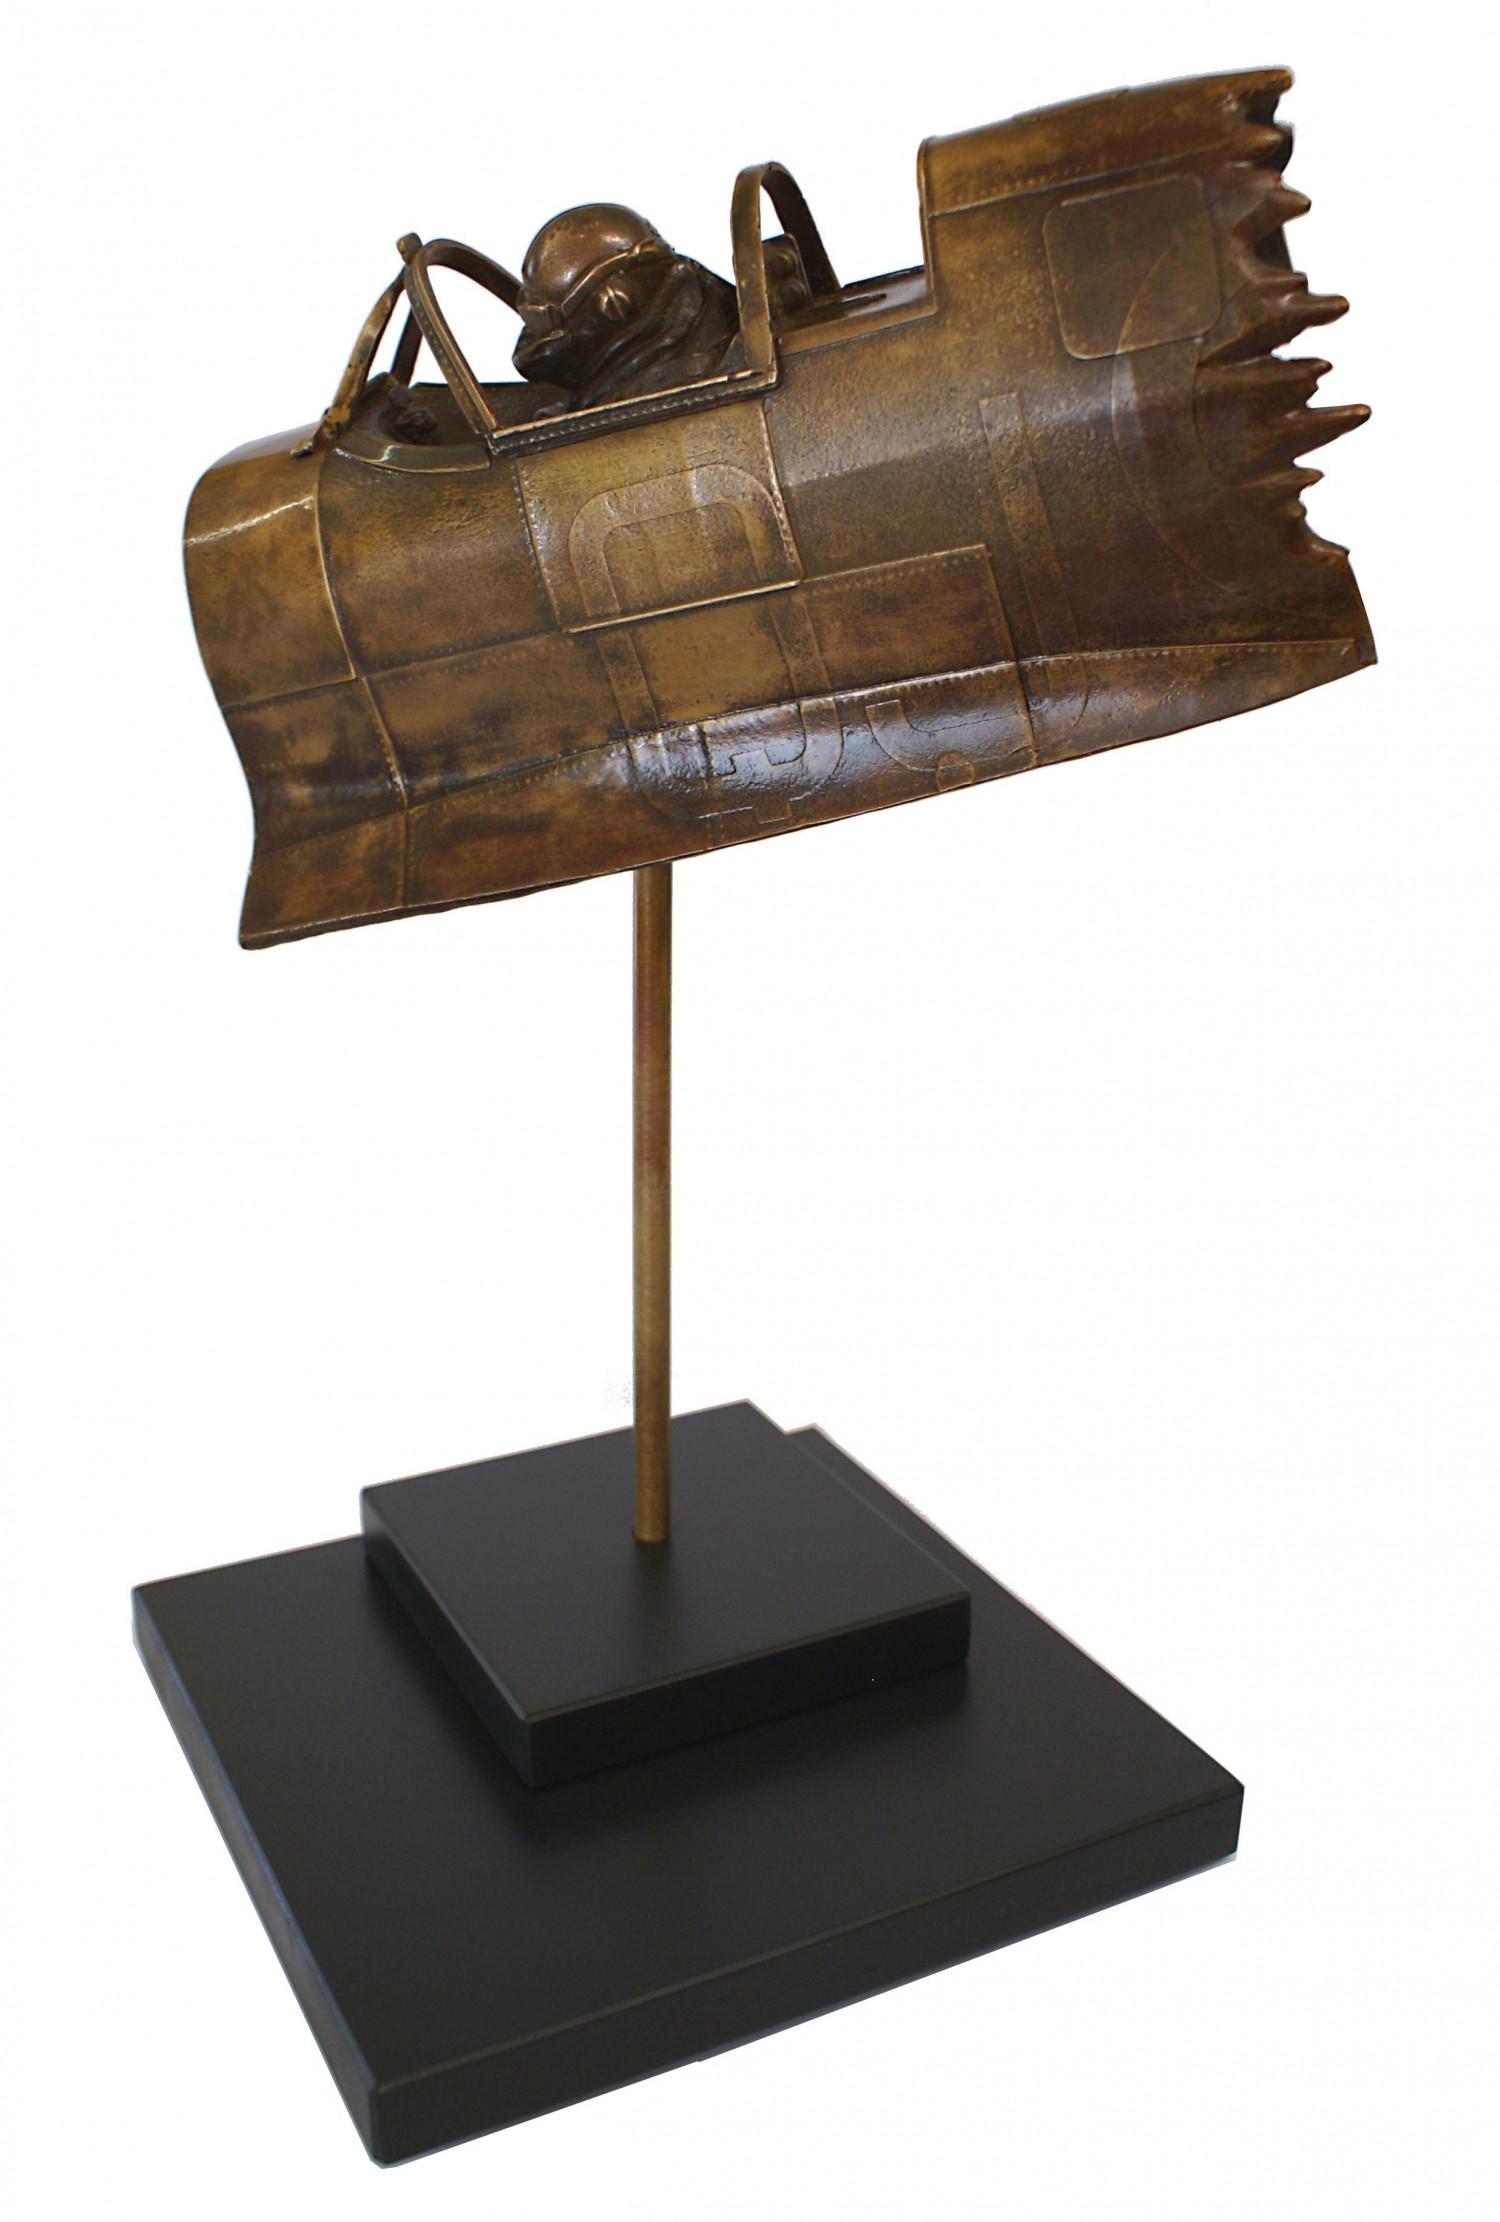 Geoffrey Wellum DFC Bronze Spitfire Sculpture